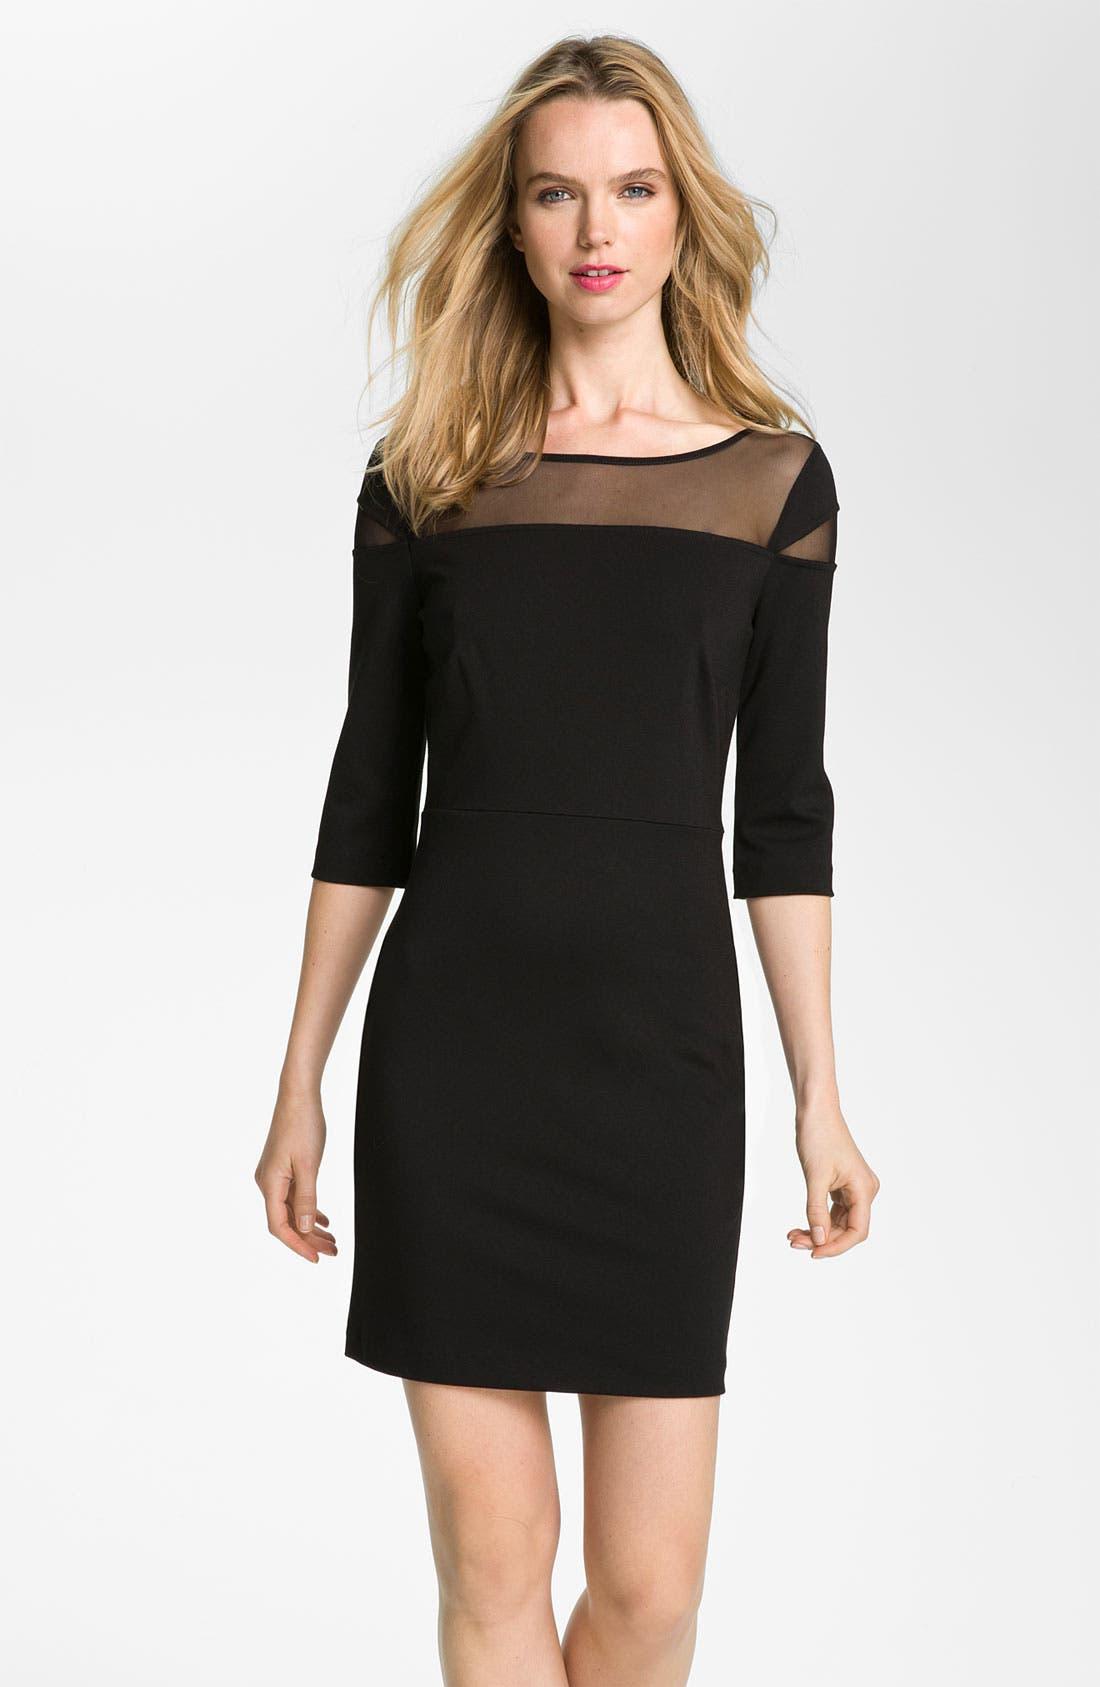 Alternate Image 1 Selected - BB Dakota Mesh Yoke Ponte Sheath Dress